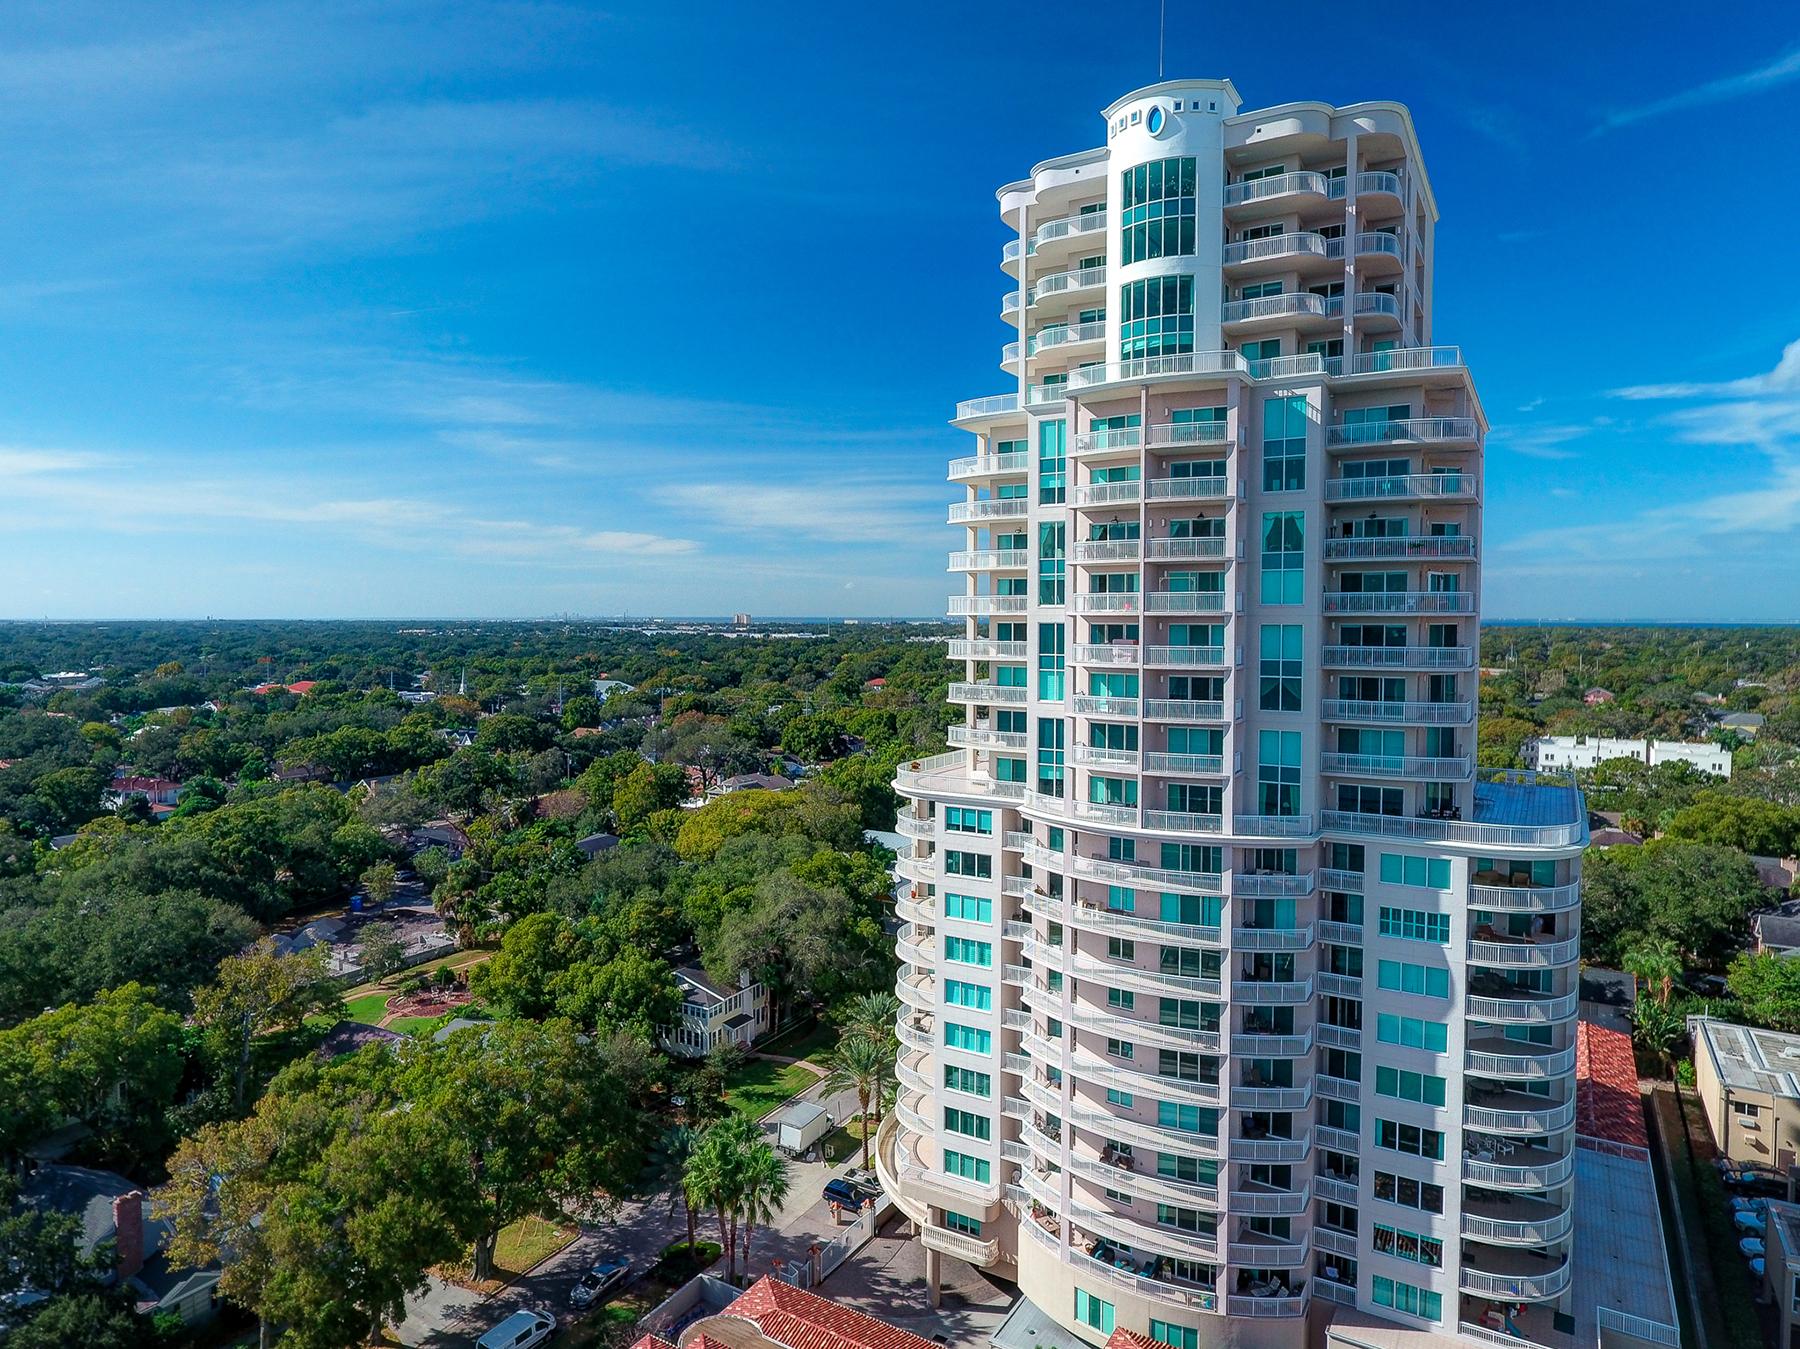 Condomínio para Venda às SOUTH TAMPA 3507 Bayshore Blvd 1601 Tampa, Florida, 33629 Estados Unidos